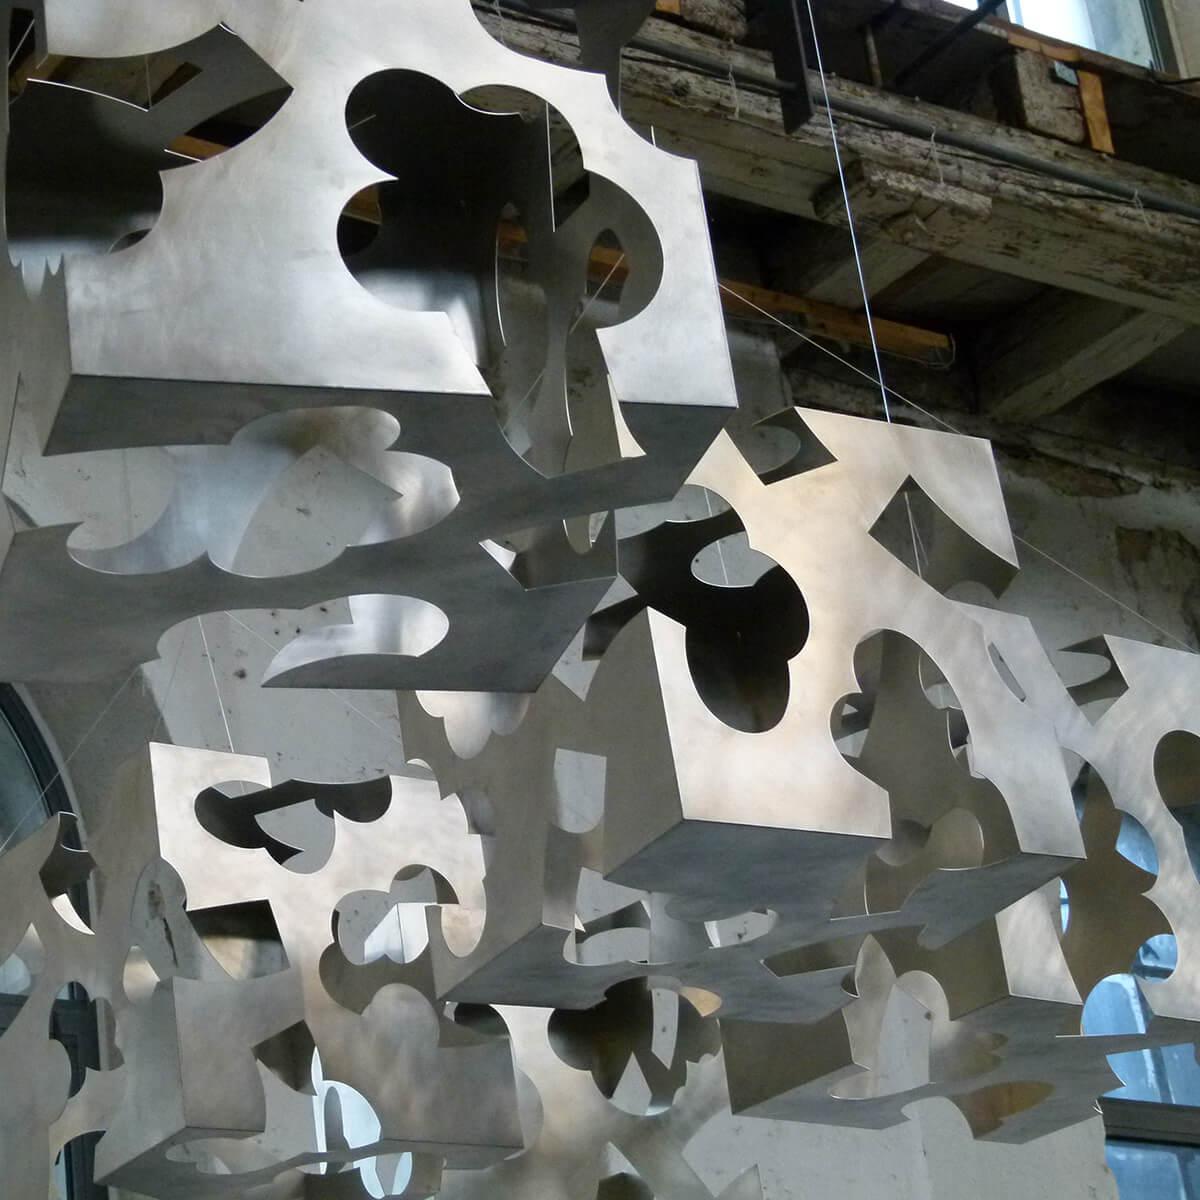 Barbara Jäger Malerei Skulptur Karlsruhe Hängende Gärten Orgelfabrik Durlach Aluminium